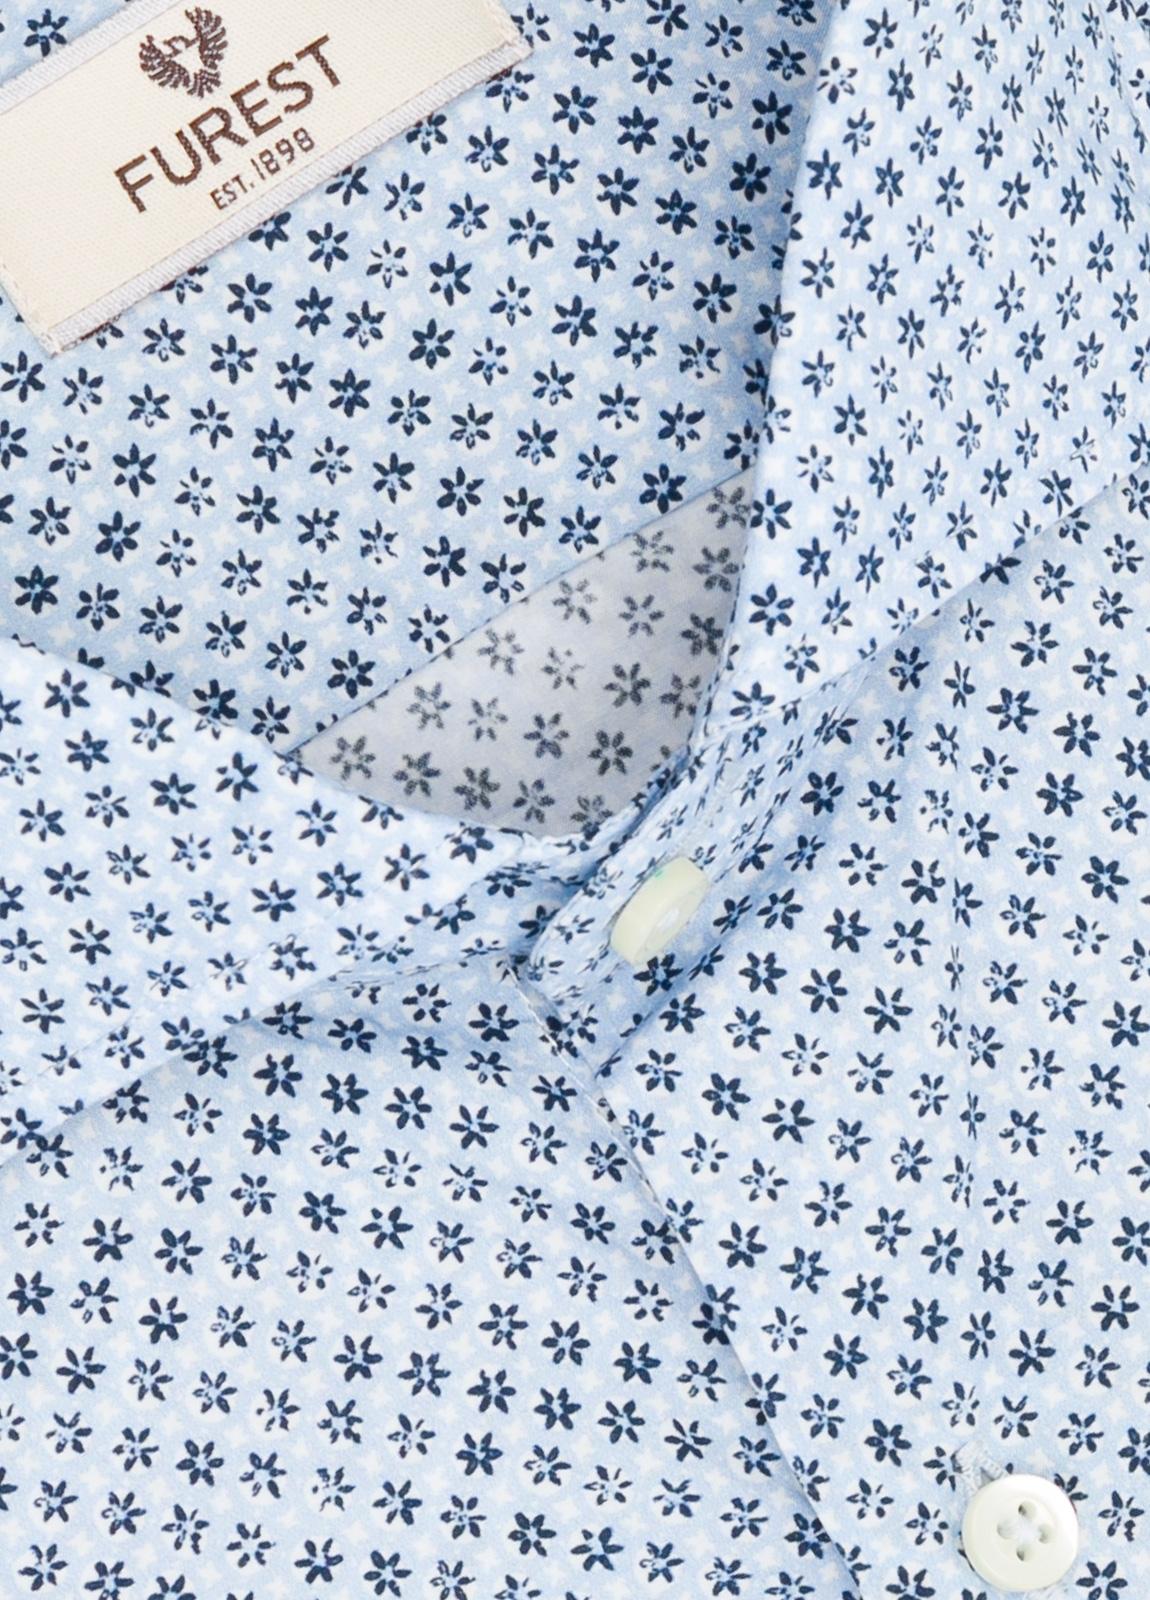 Camisa Leisure Wear SLIM FIT Modelo CAPRI estampado micro flor color azul, 100% Algodón. - Ítem1